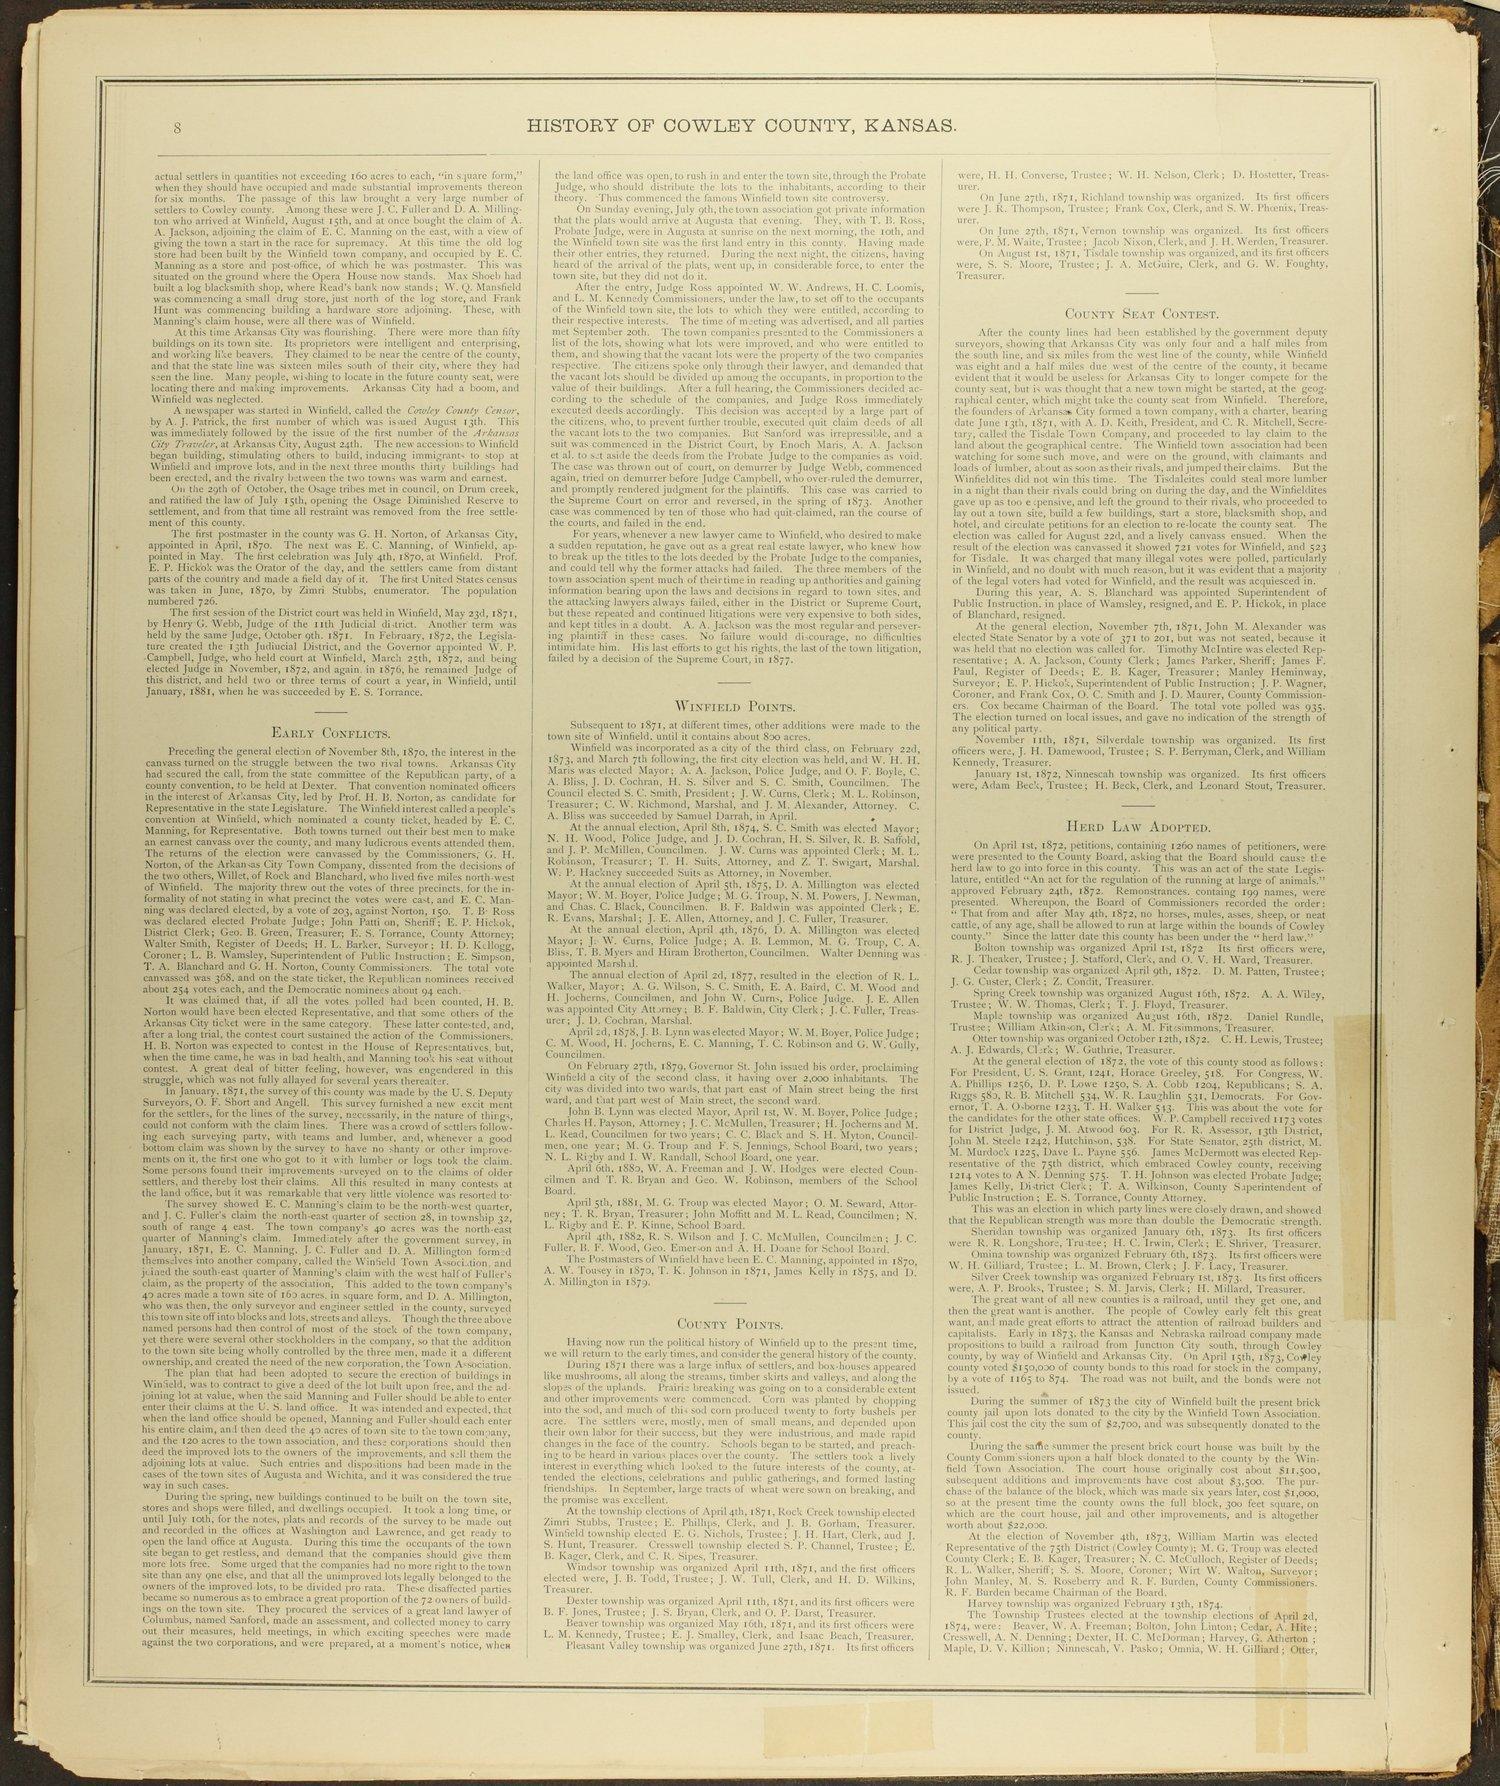 Historical atlas of Cowley County, Kansas - 8